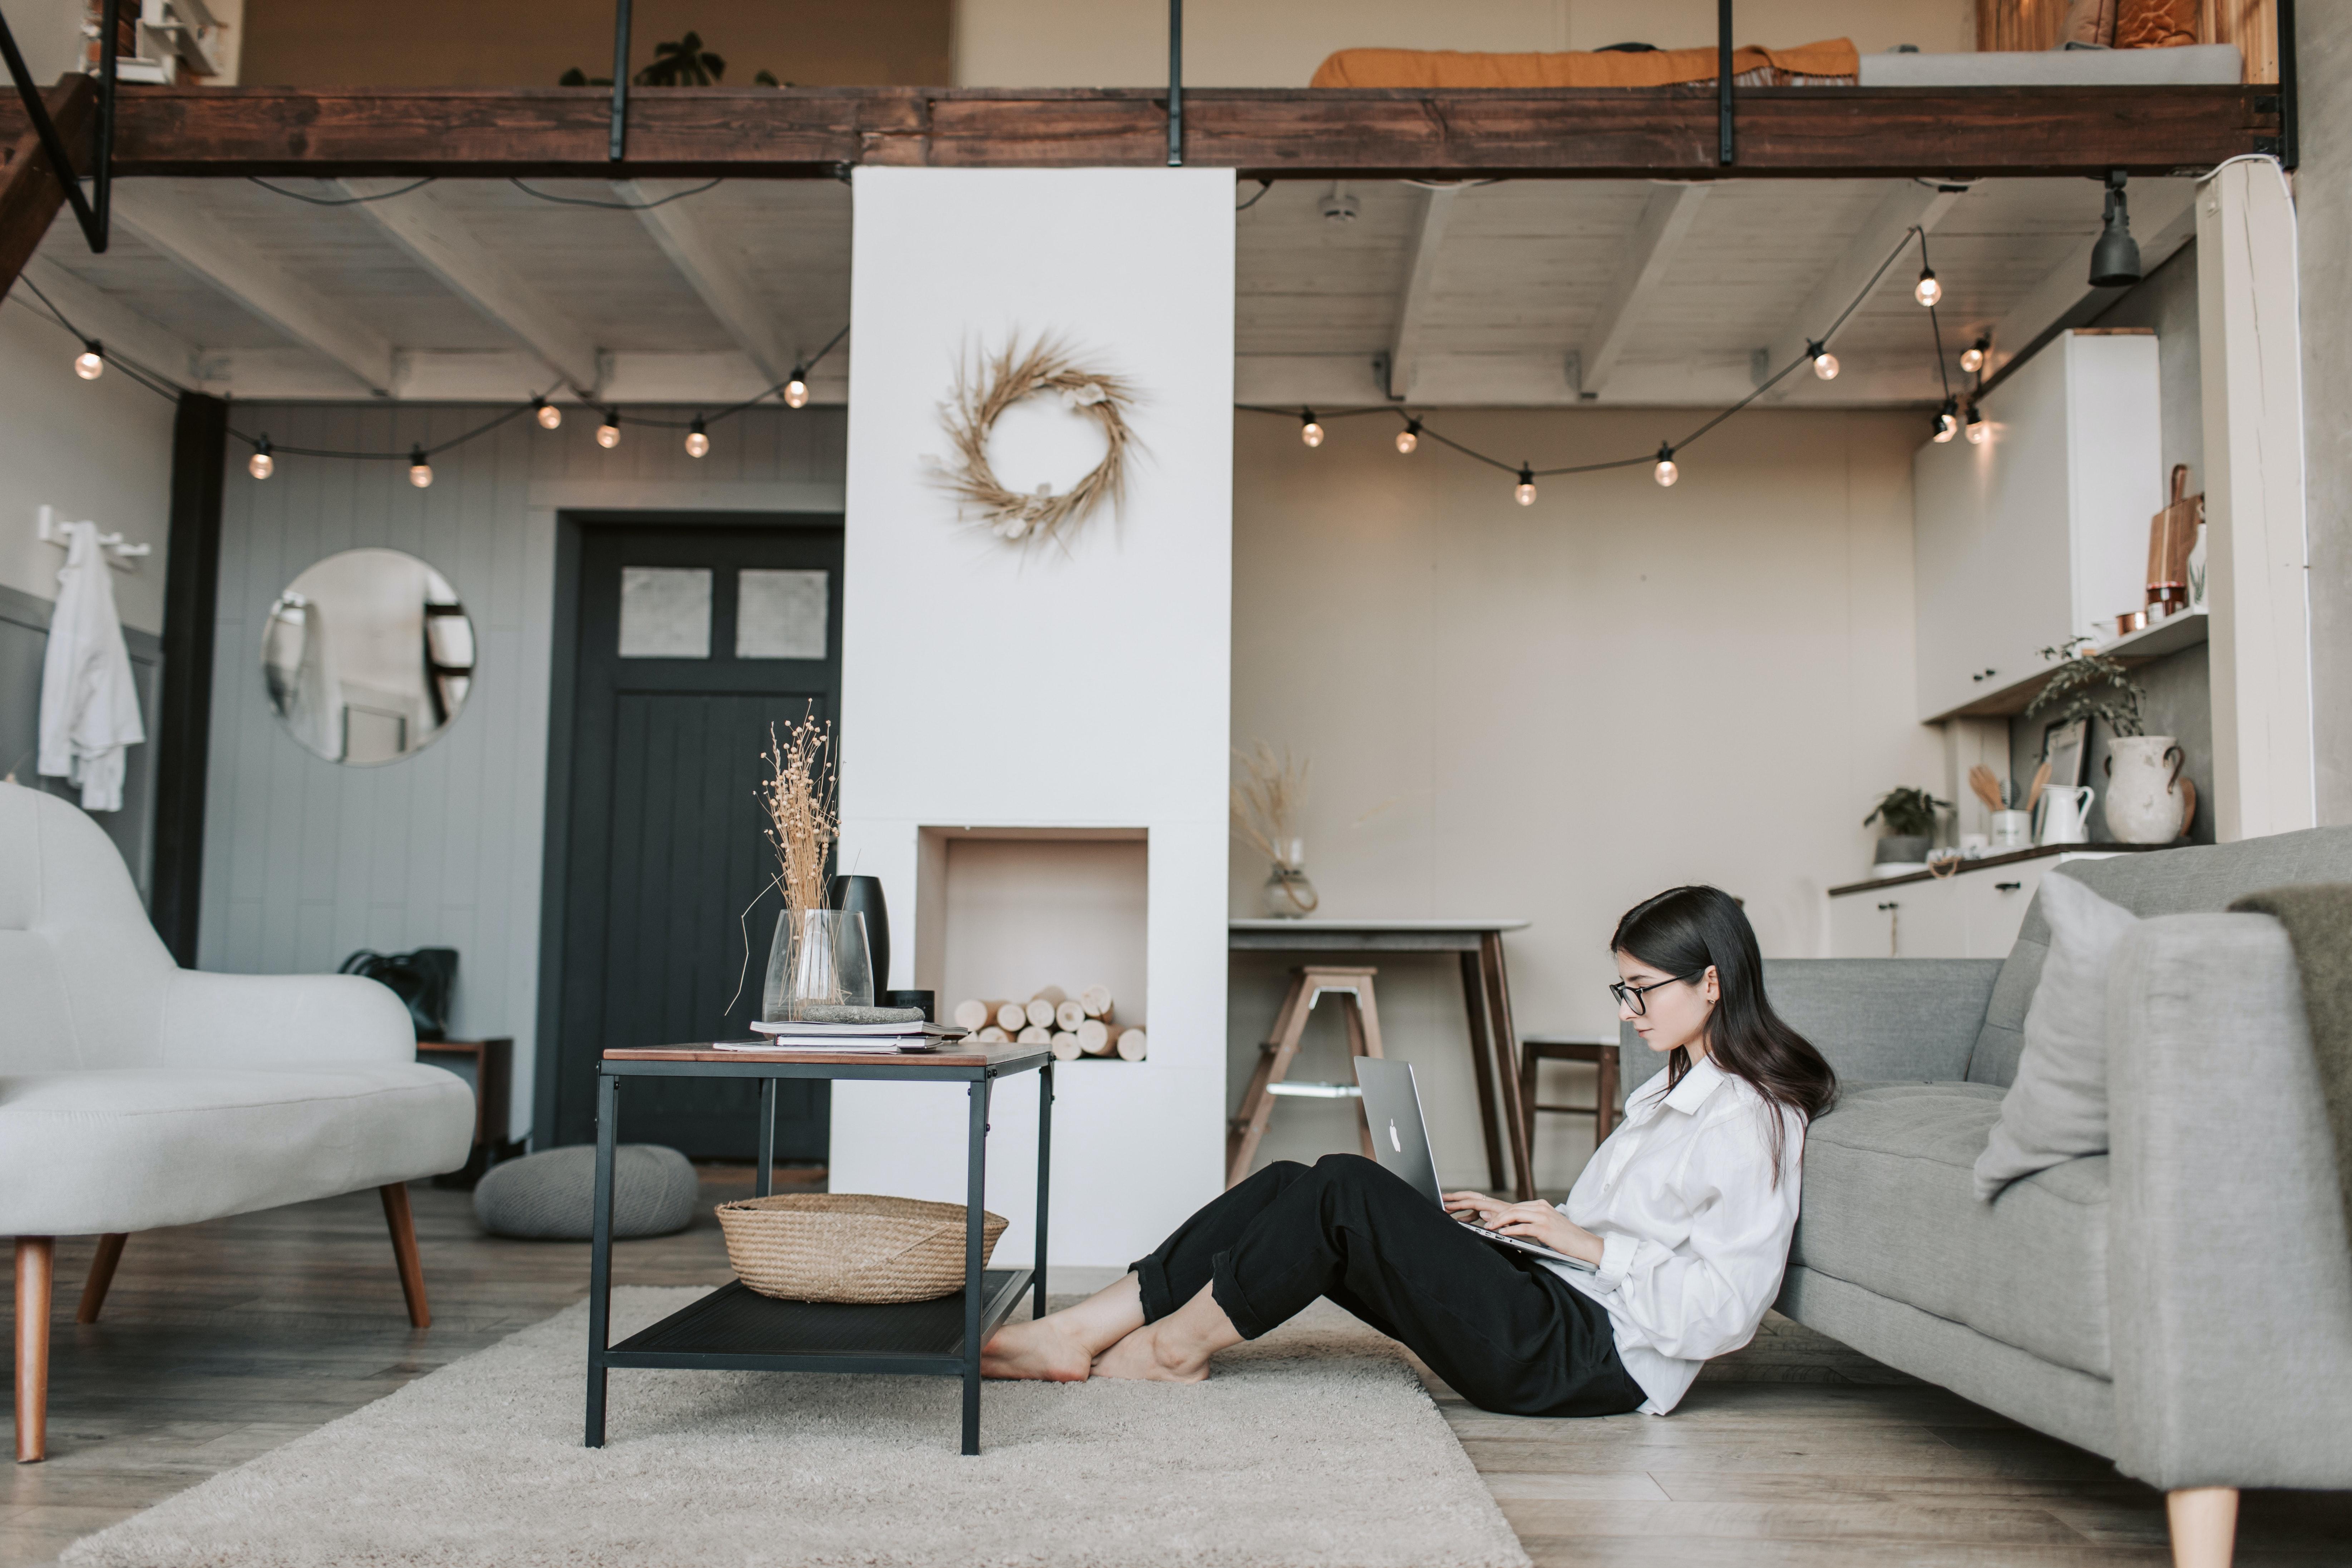 6 Gambar Rumah Sederhana Kecil Sih Tapi Hangat dan Cozy